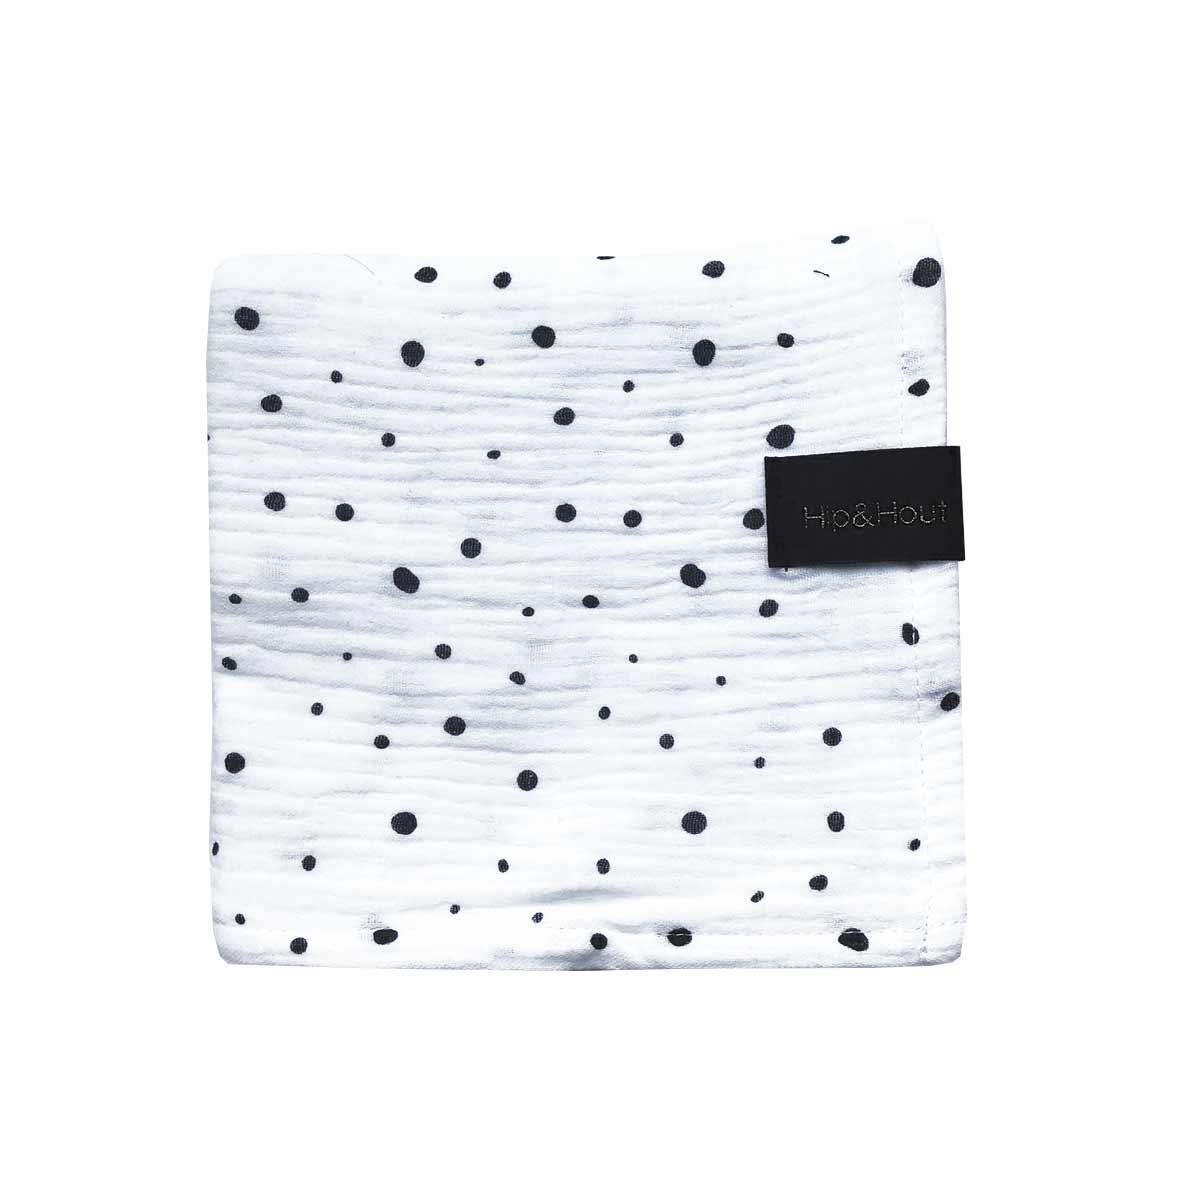 Hydrofiele-doek-dot-wit-zwart